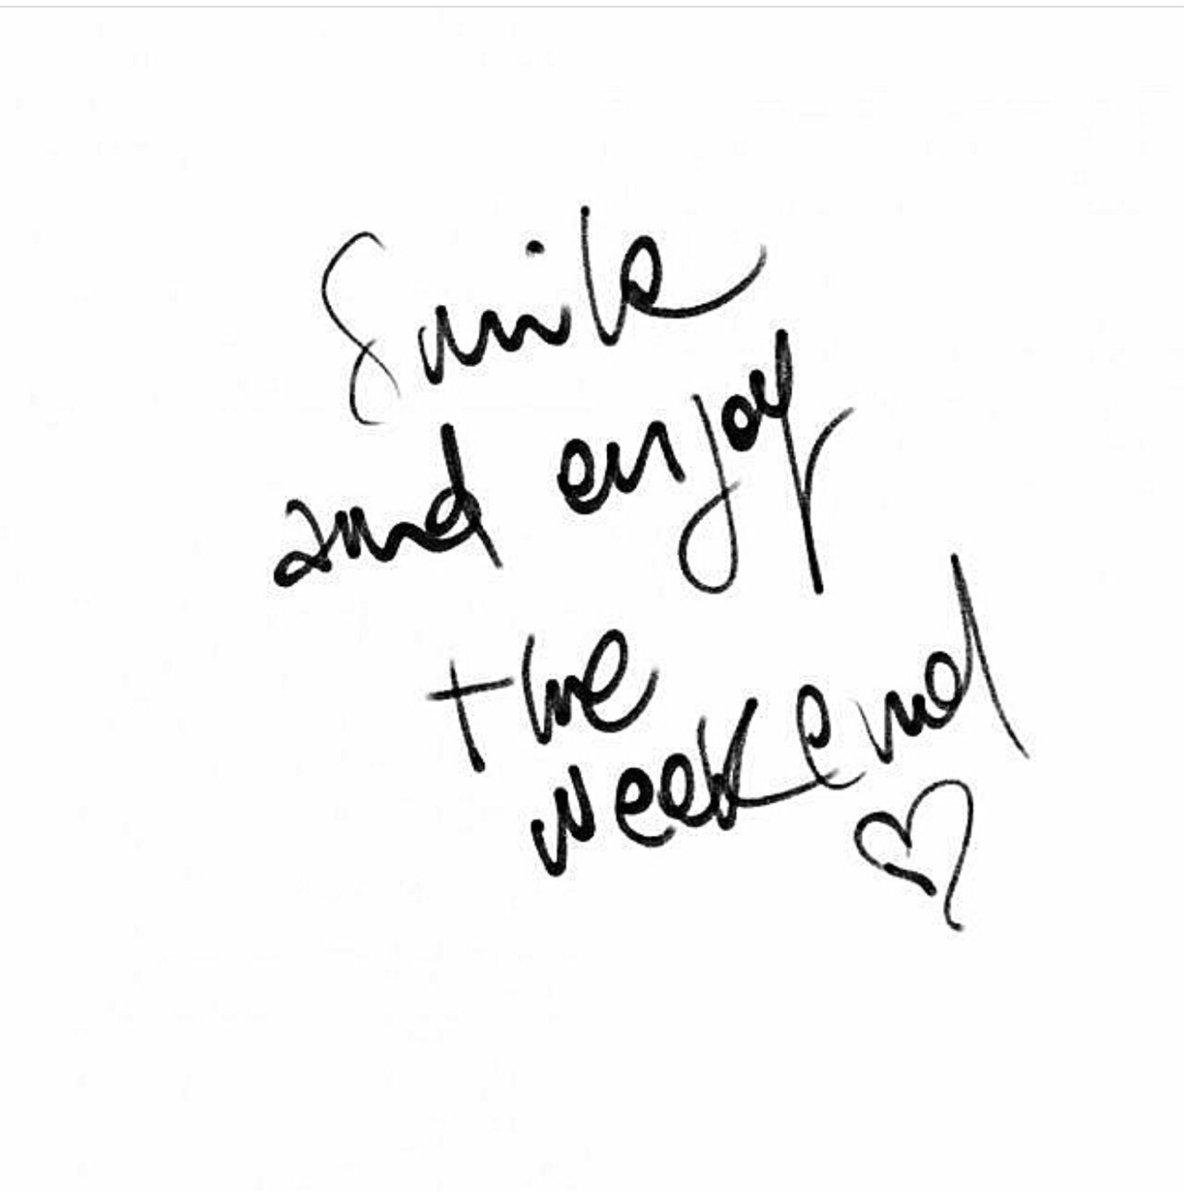 Smile It's The Weekend! #quotes #entrepreneur #inspire #motivation #positivevibes #grind #hustle #goaldigger #zen #goals #weekendvibes<br>http://pic.twitter.com/DIaa45cec0